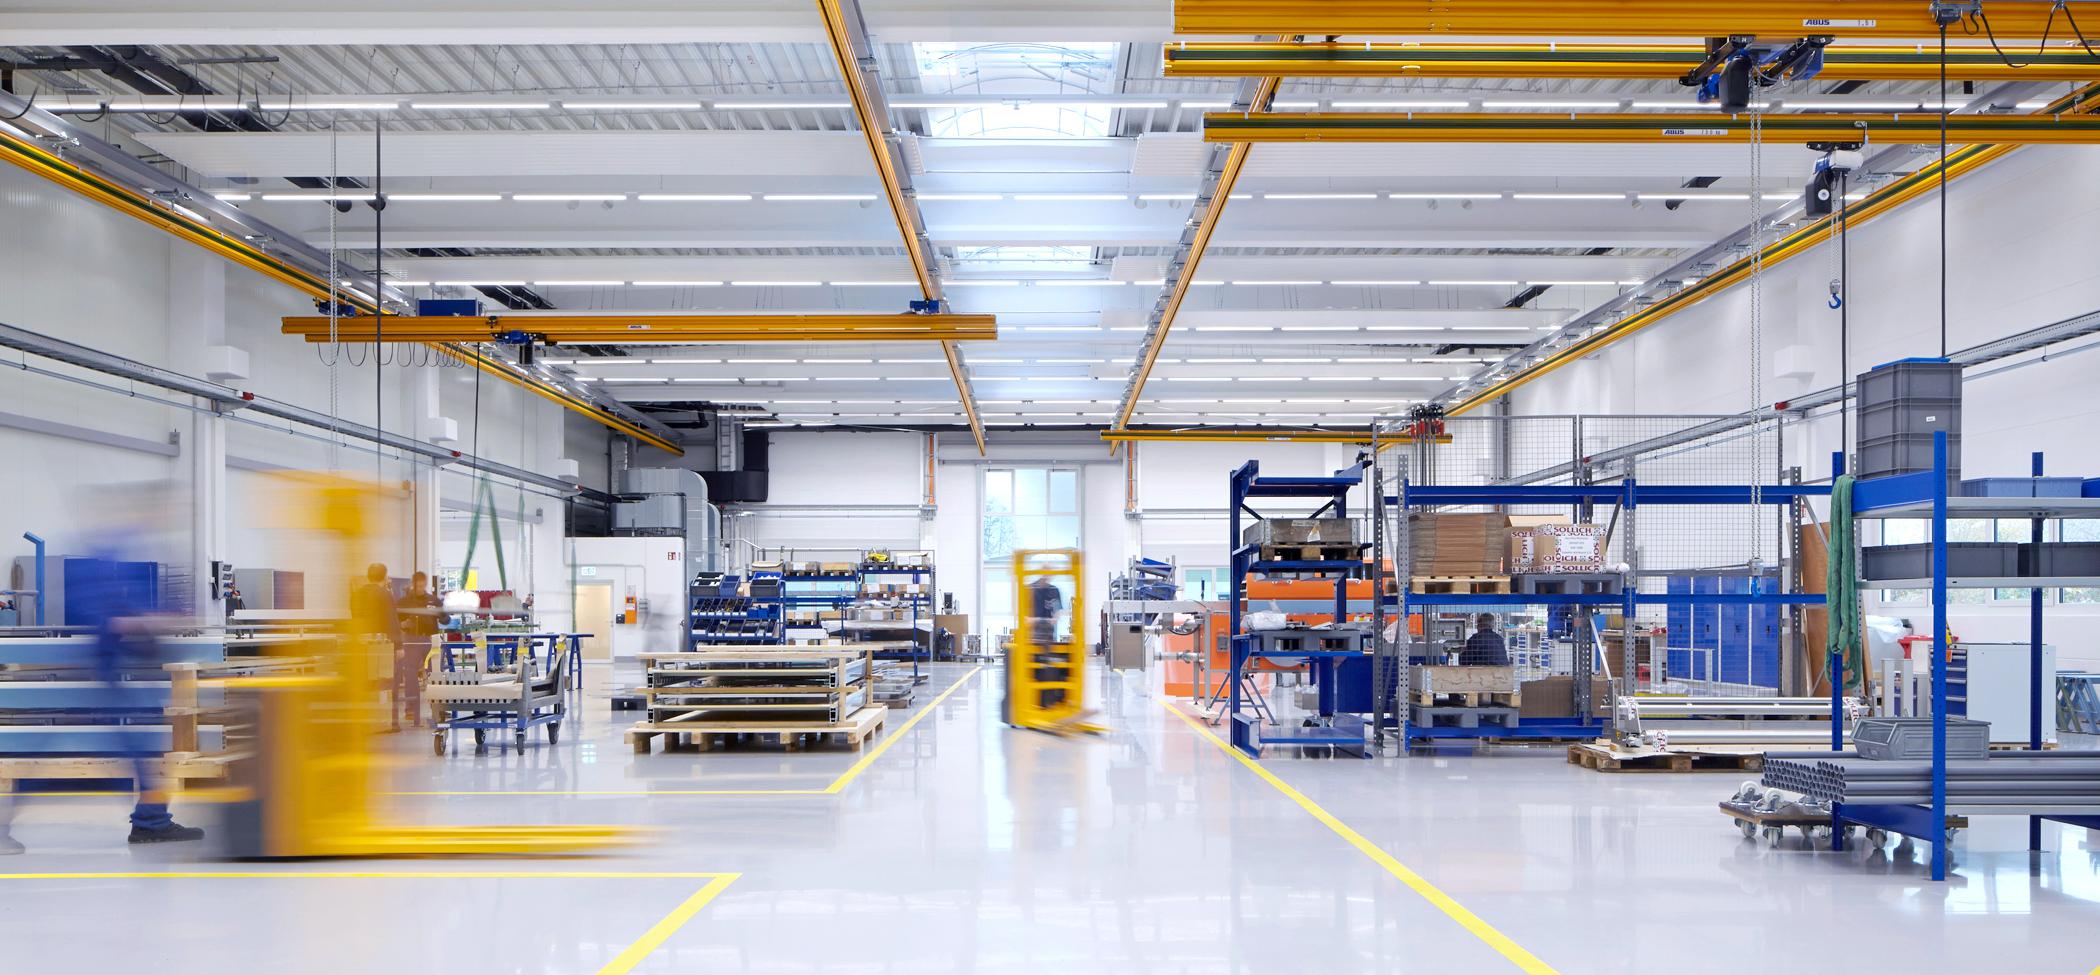 33903 33903 33903 & Innovative LED lighting solutions and lighting management - Zumtobel